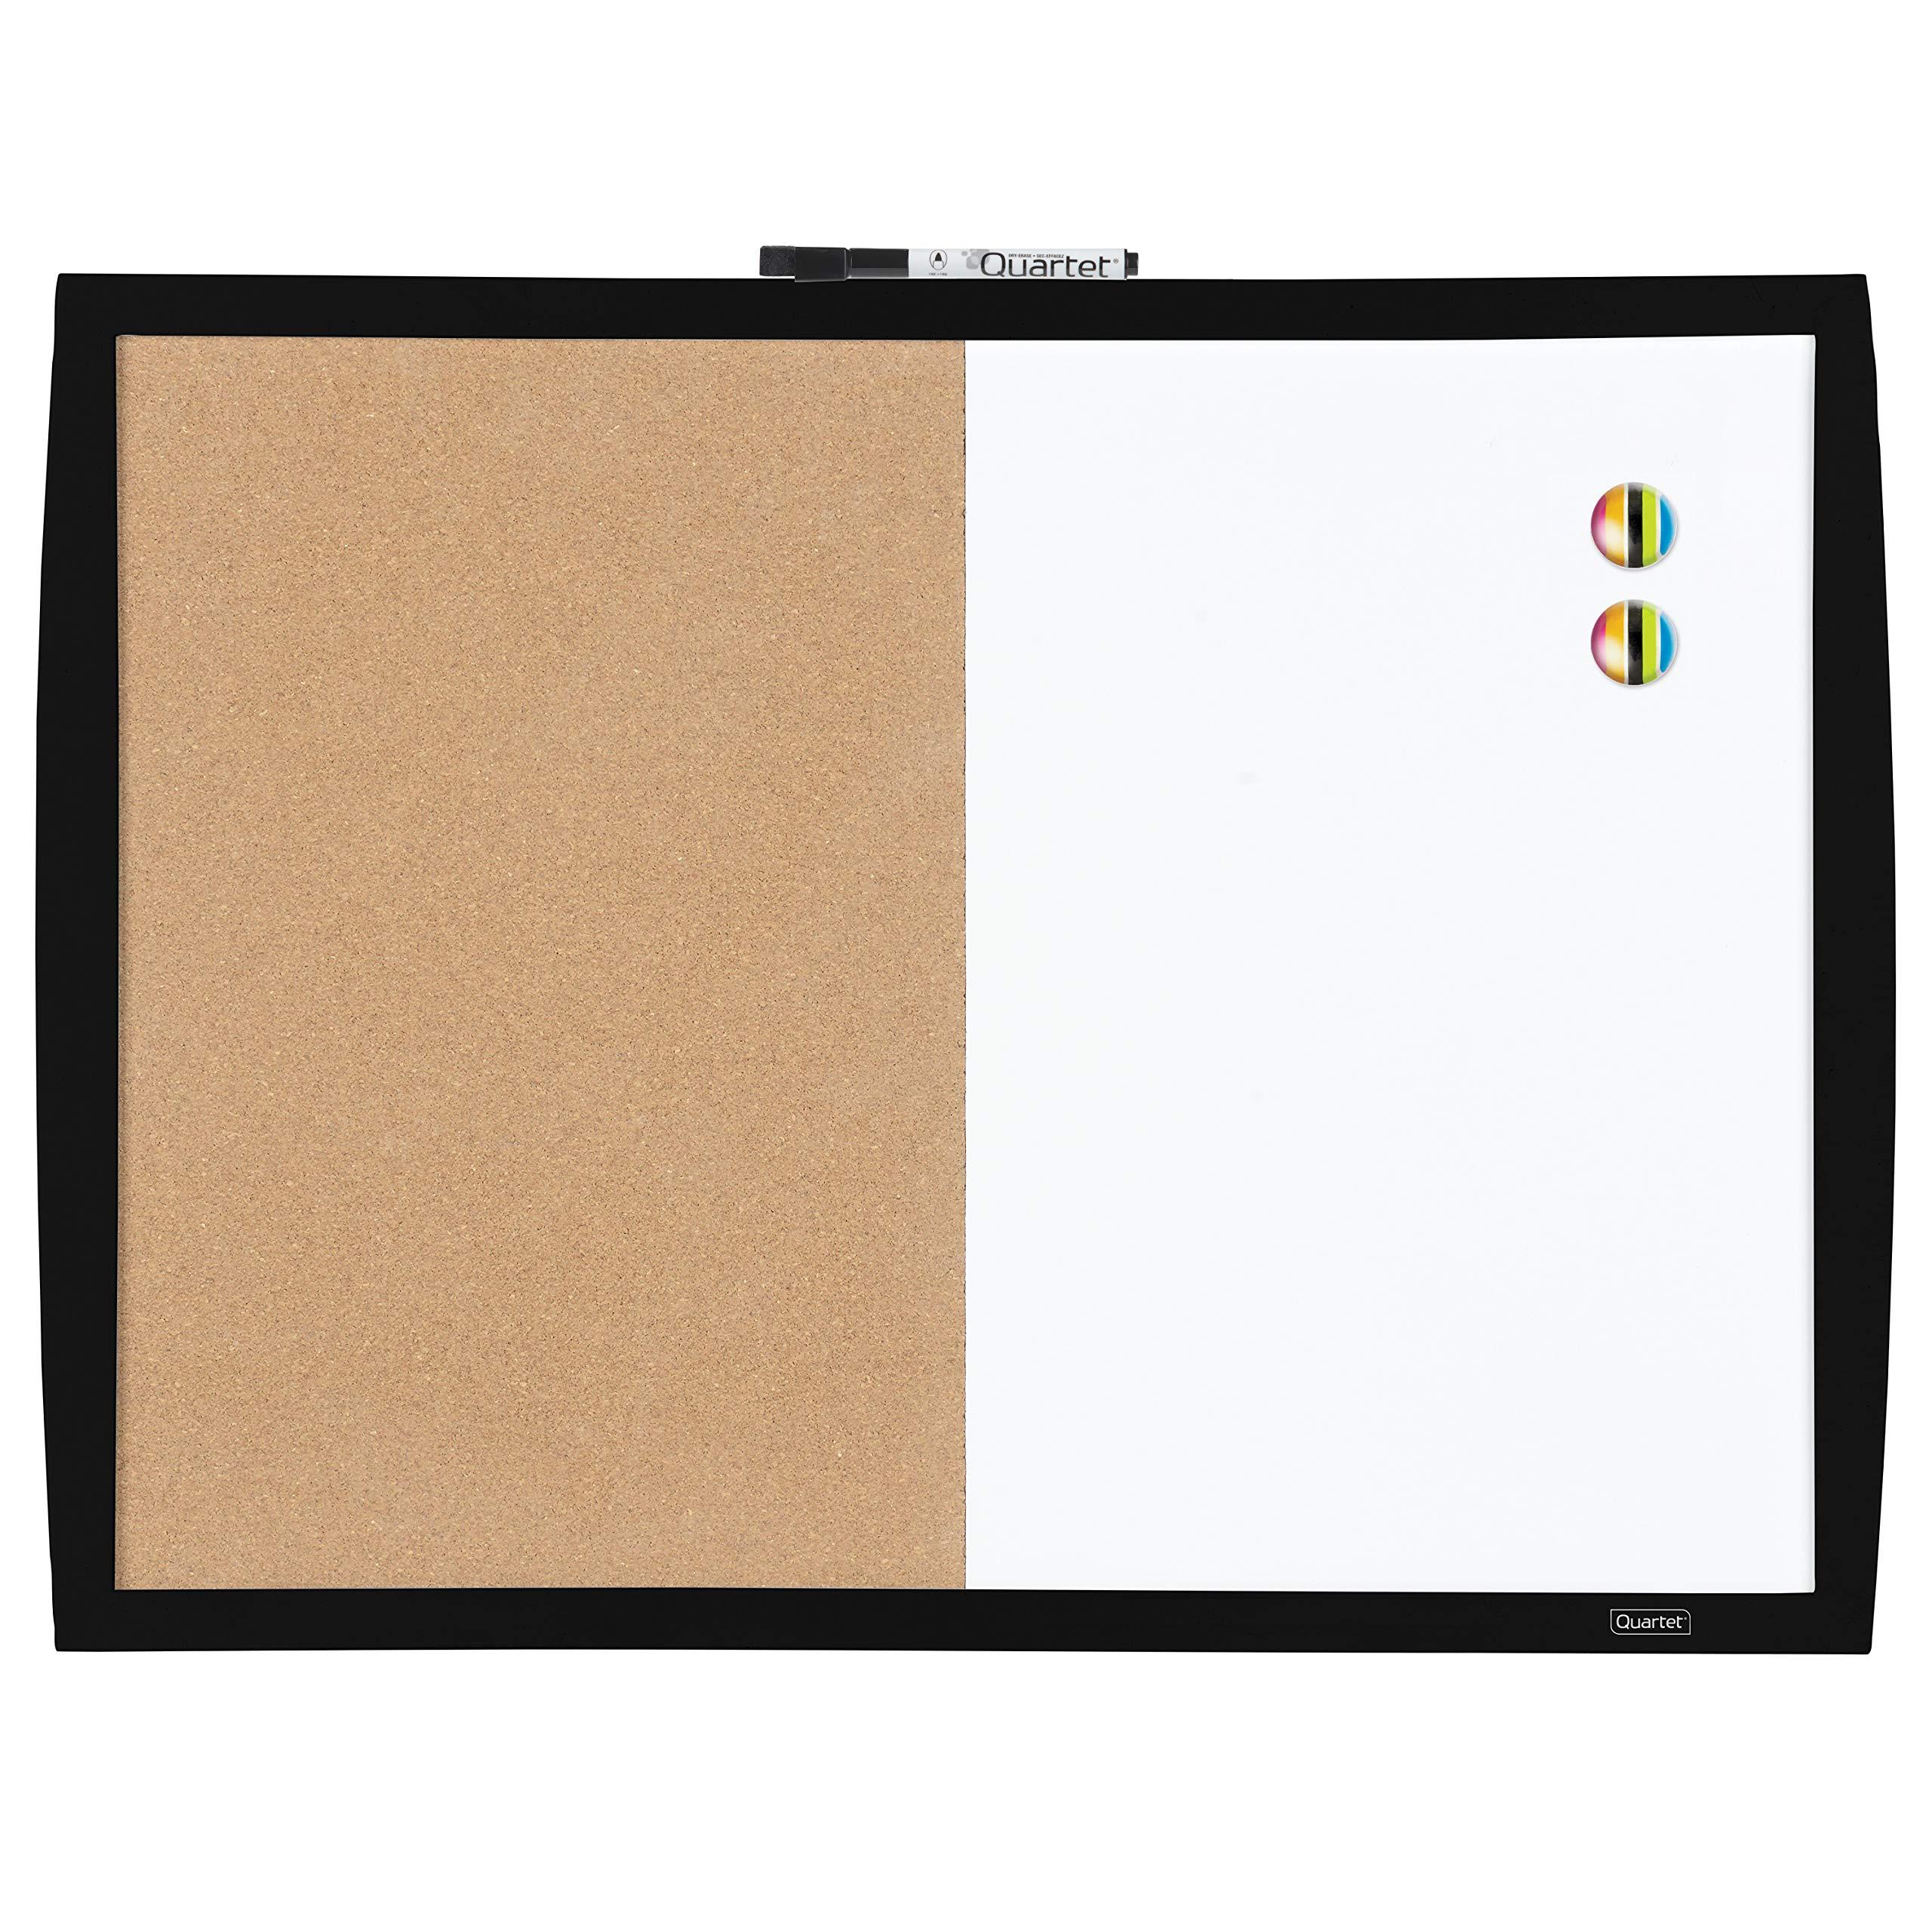 Quartet Combination Magnetic Whiteboard & Corkboard, 17'' x 23'', Combo White Board & Cork Board, Curved Frame, Black (41723-BK)